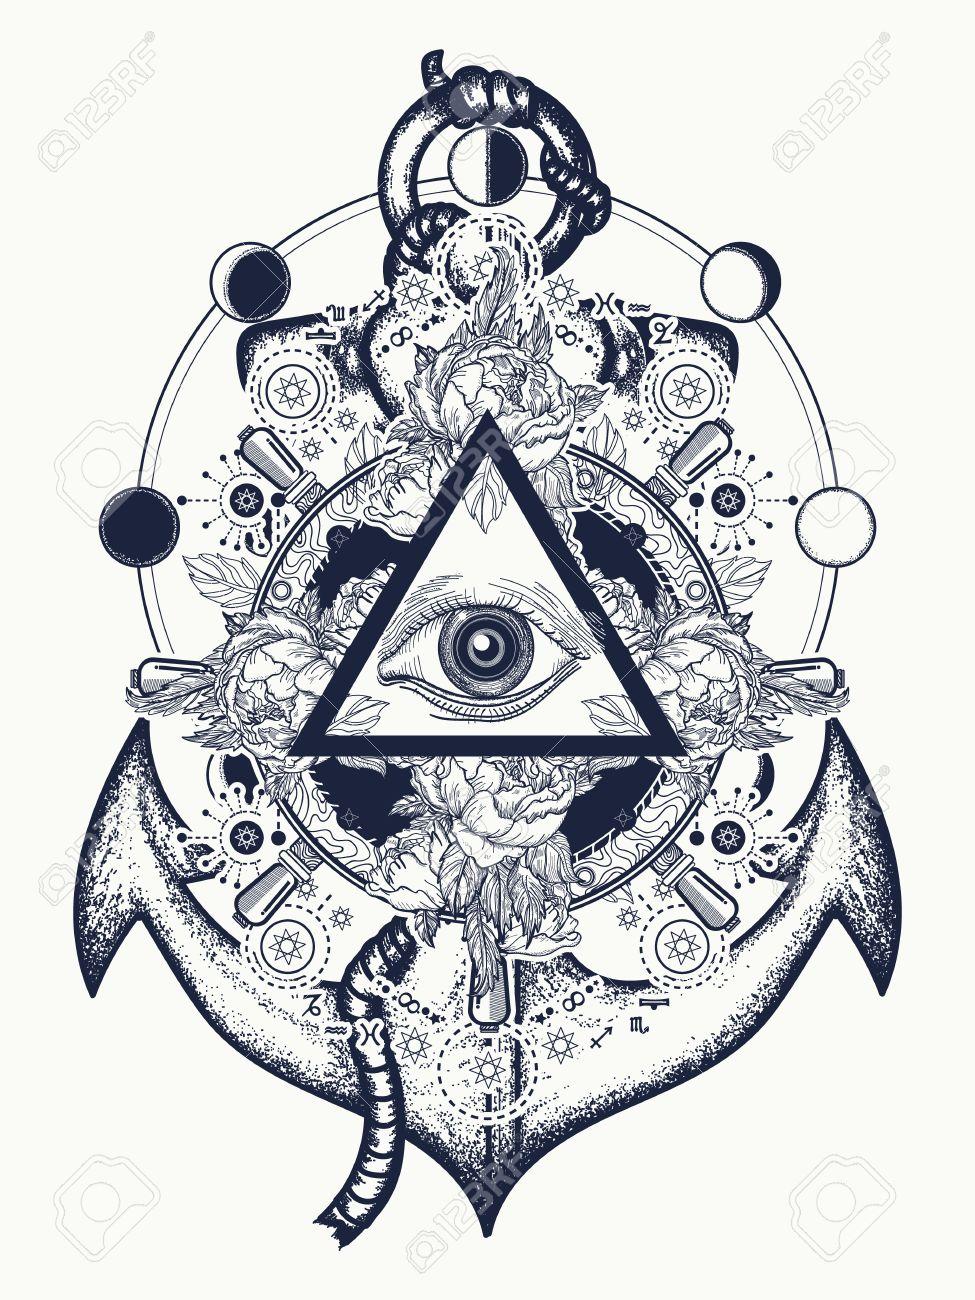 All Seeing Eye Tattoo Art Freemason And Spiritual Symbols Alchemy